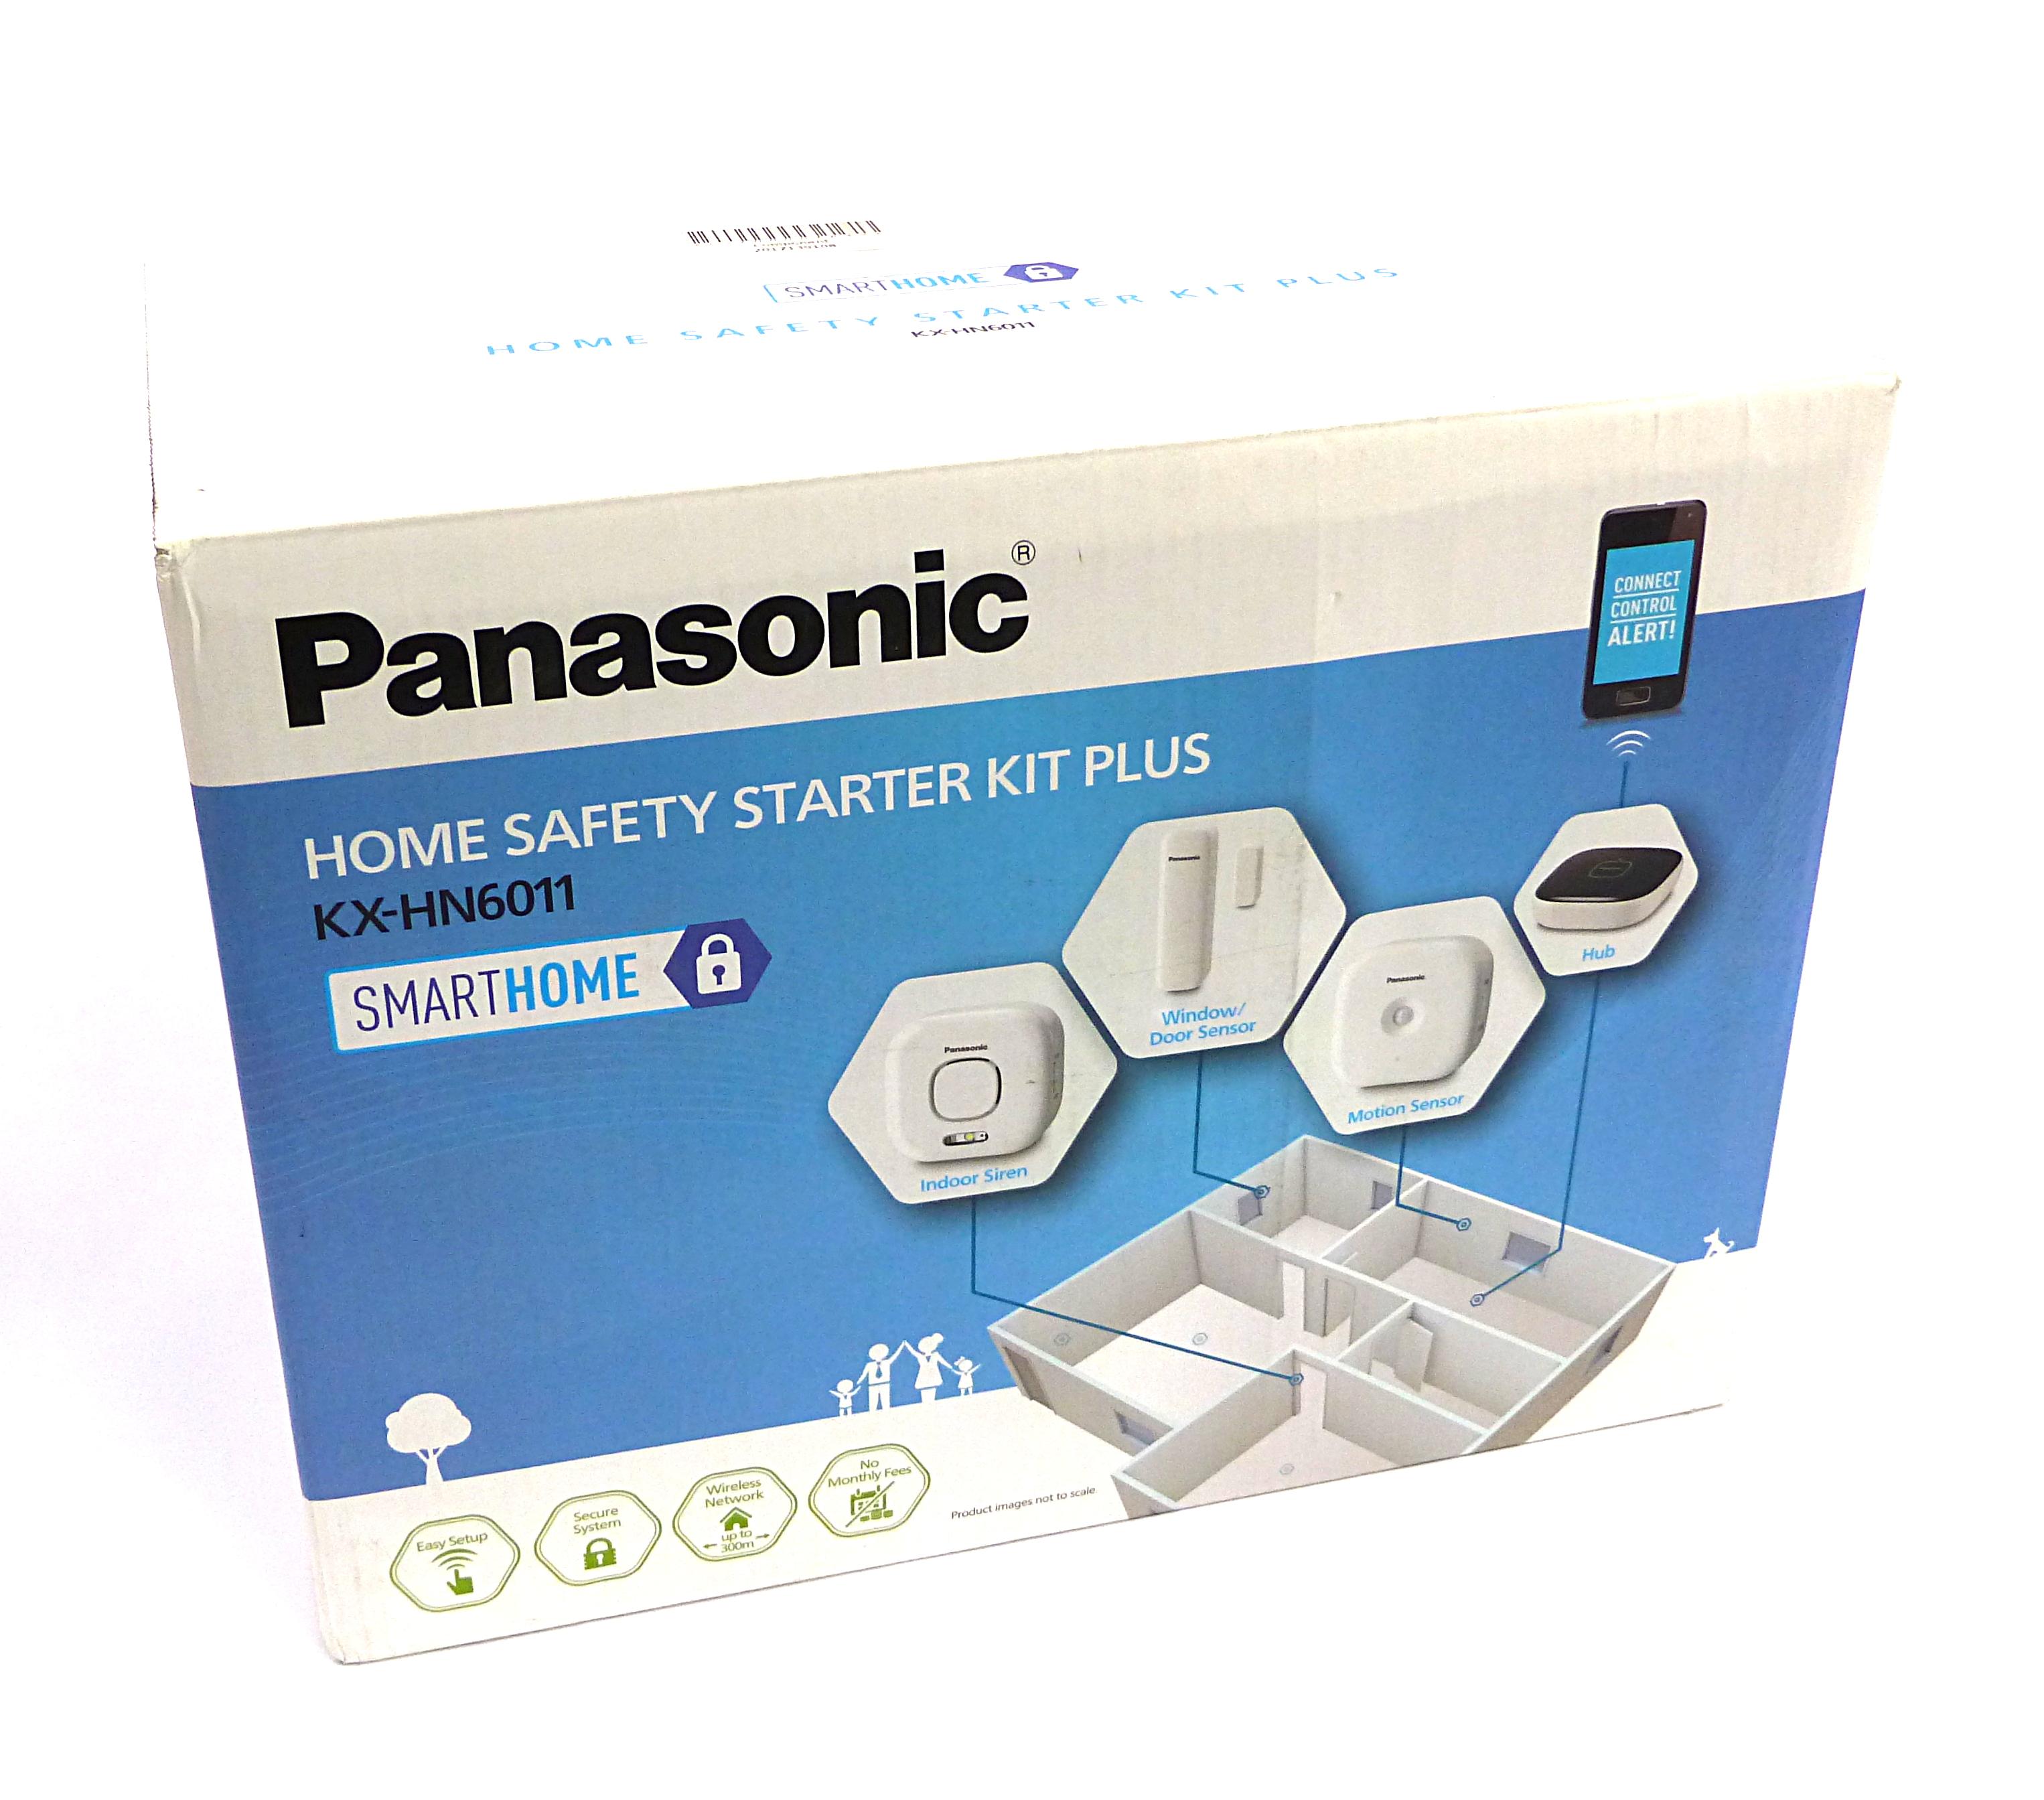 Panasonic KX-HN6011 SmartHome Home Safety Starter Kit Plus